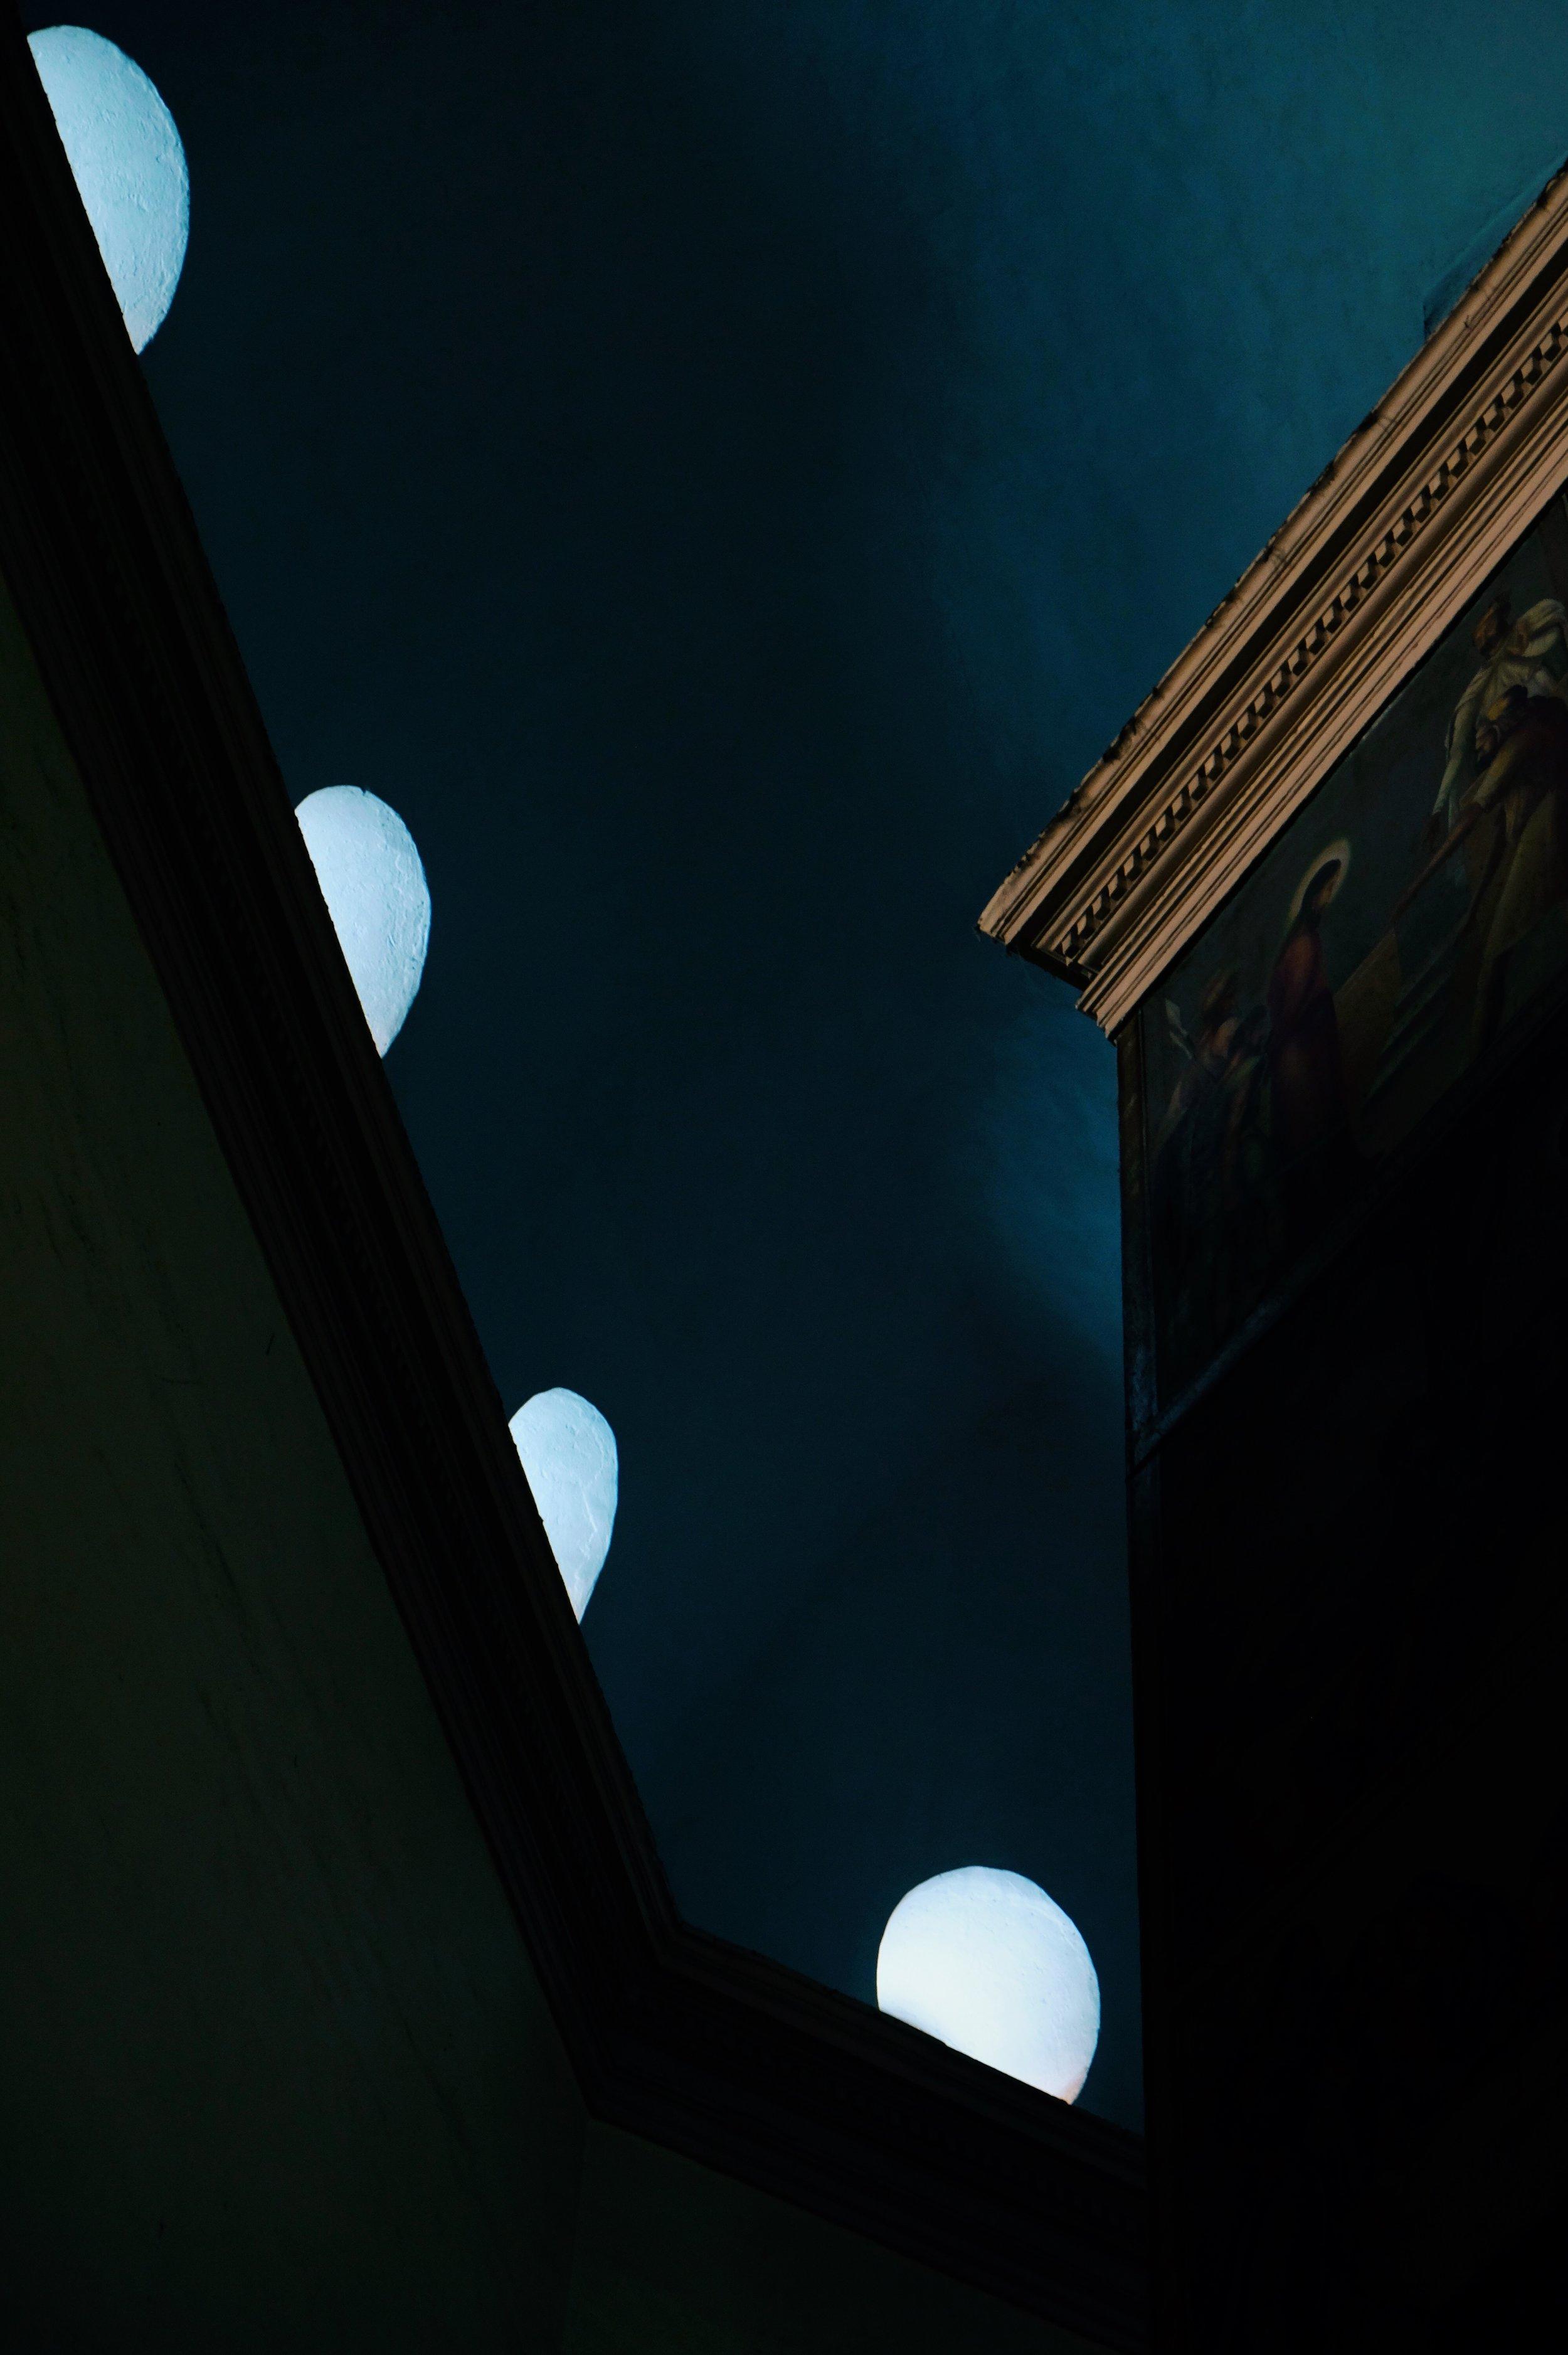 Ceiling Saint George Church in Ethiopia by Joost Bastmeijer.jpeg